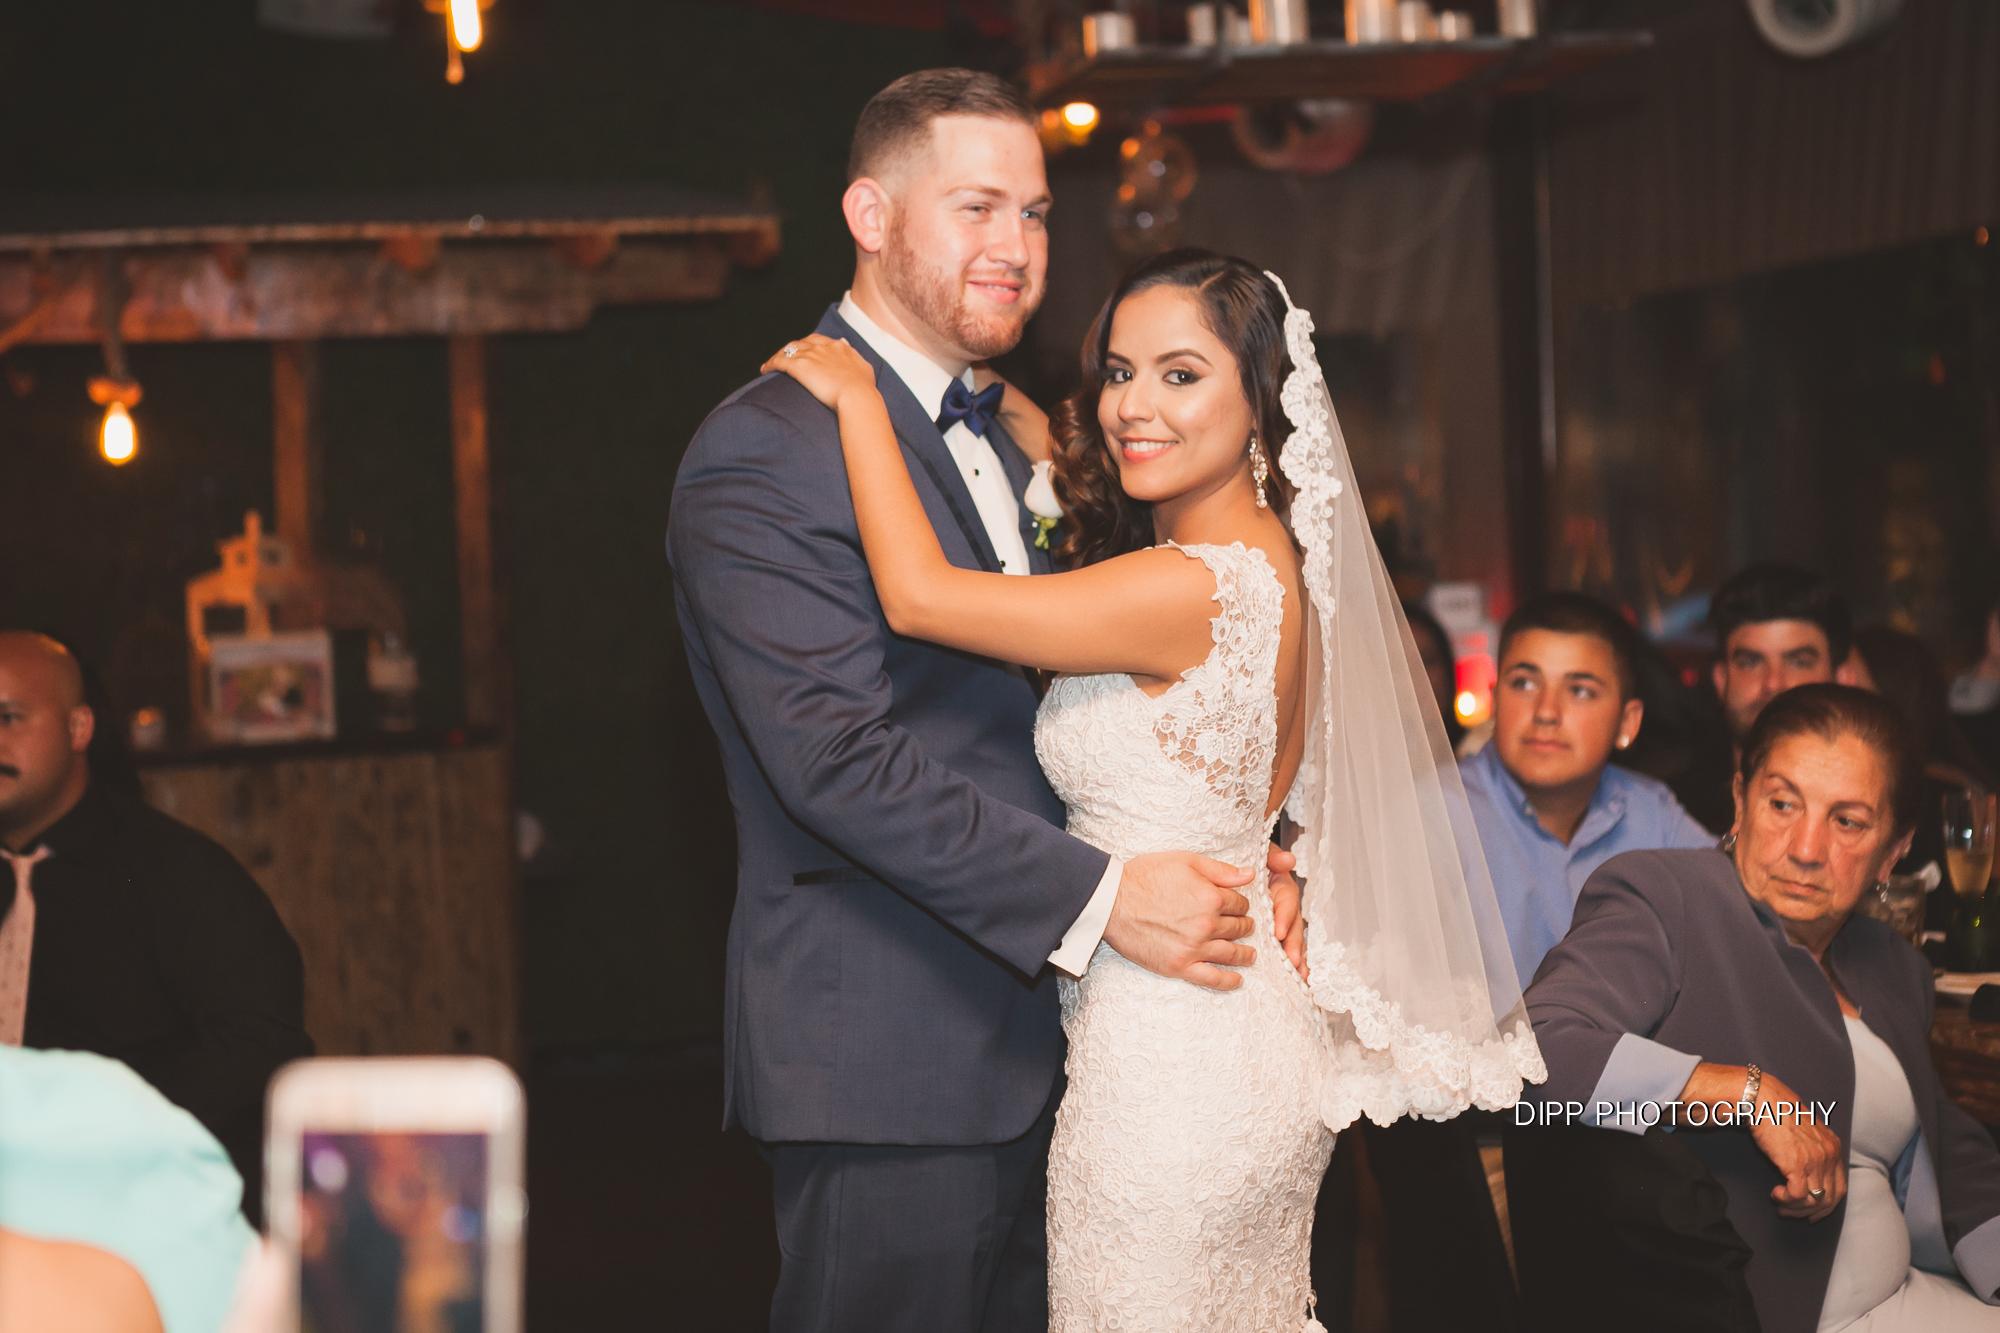 Dipp_2016 EDITED Melissa & Avilio Wedding-477